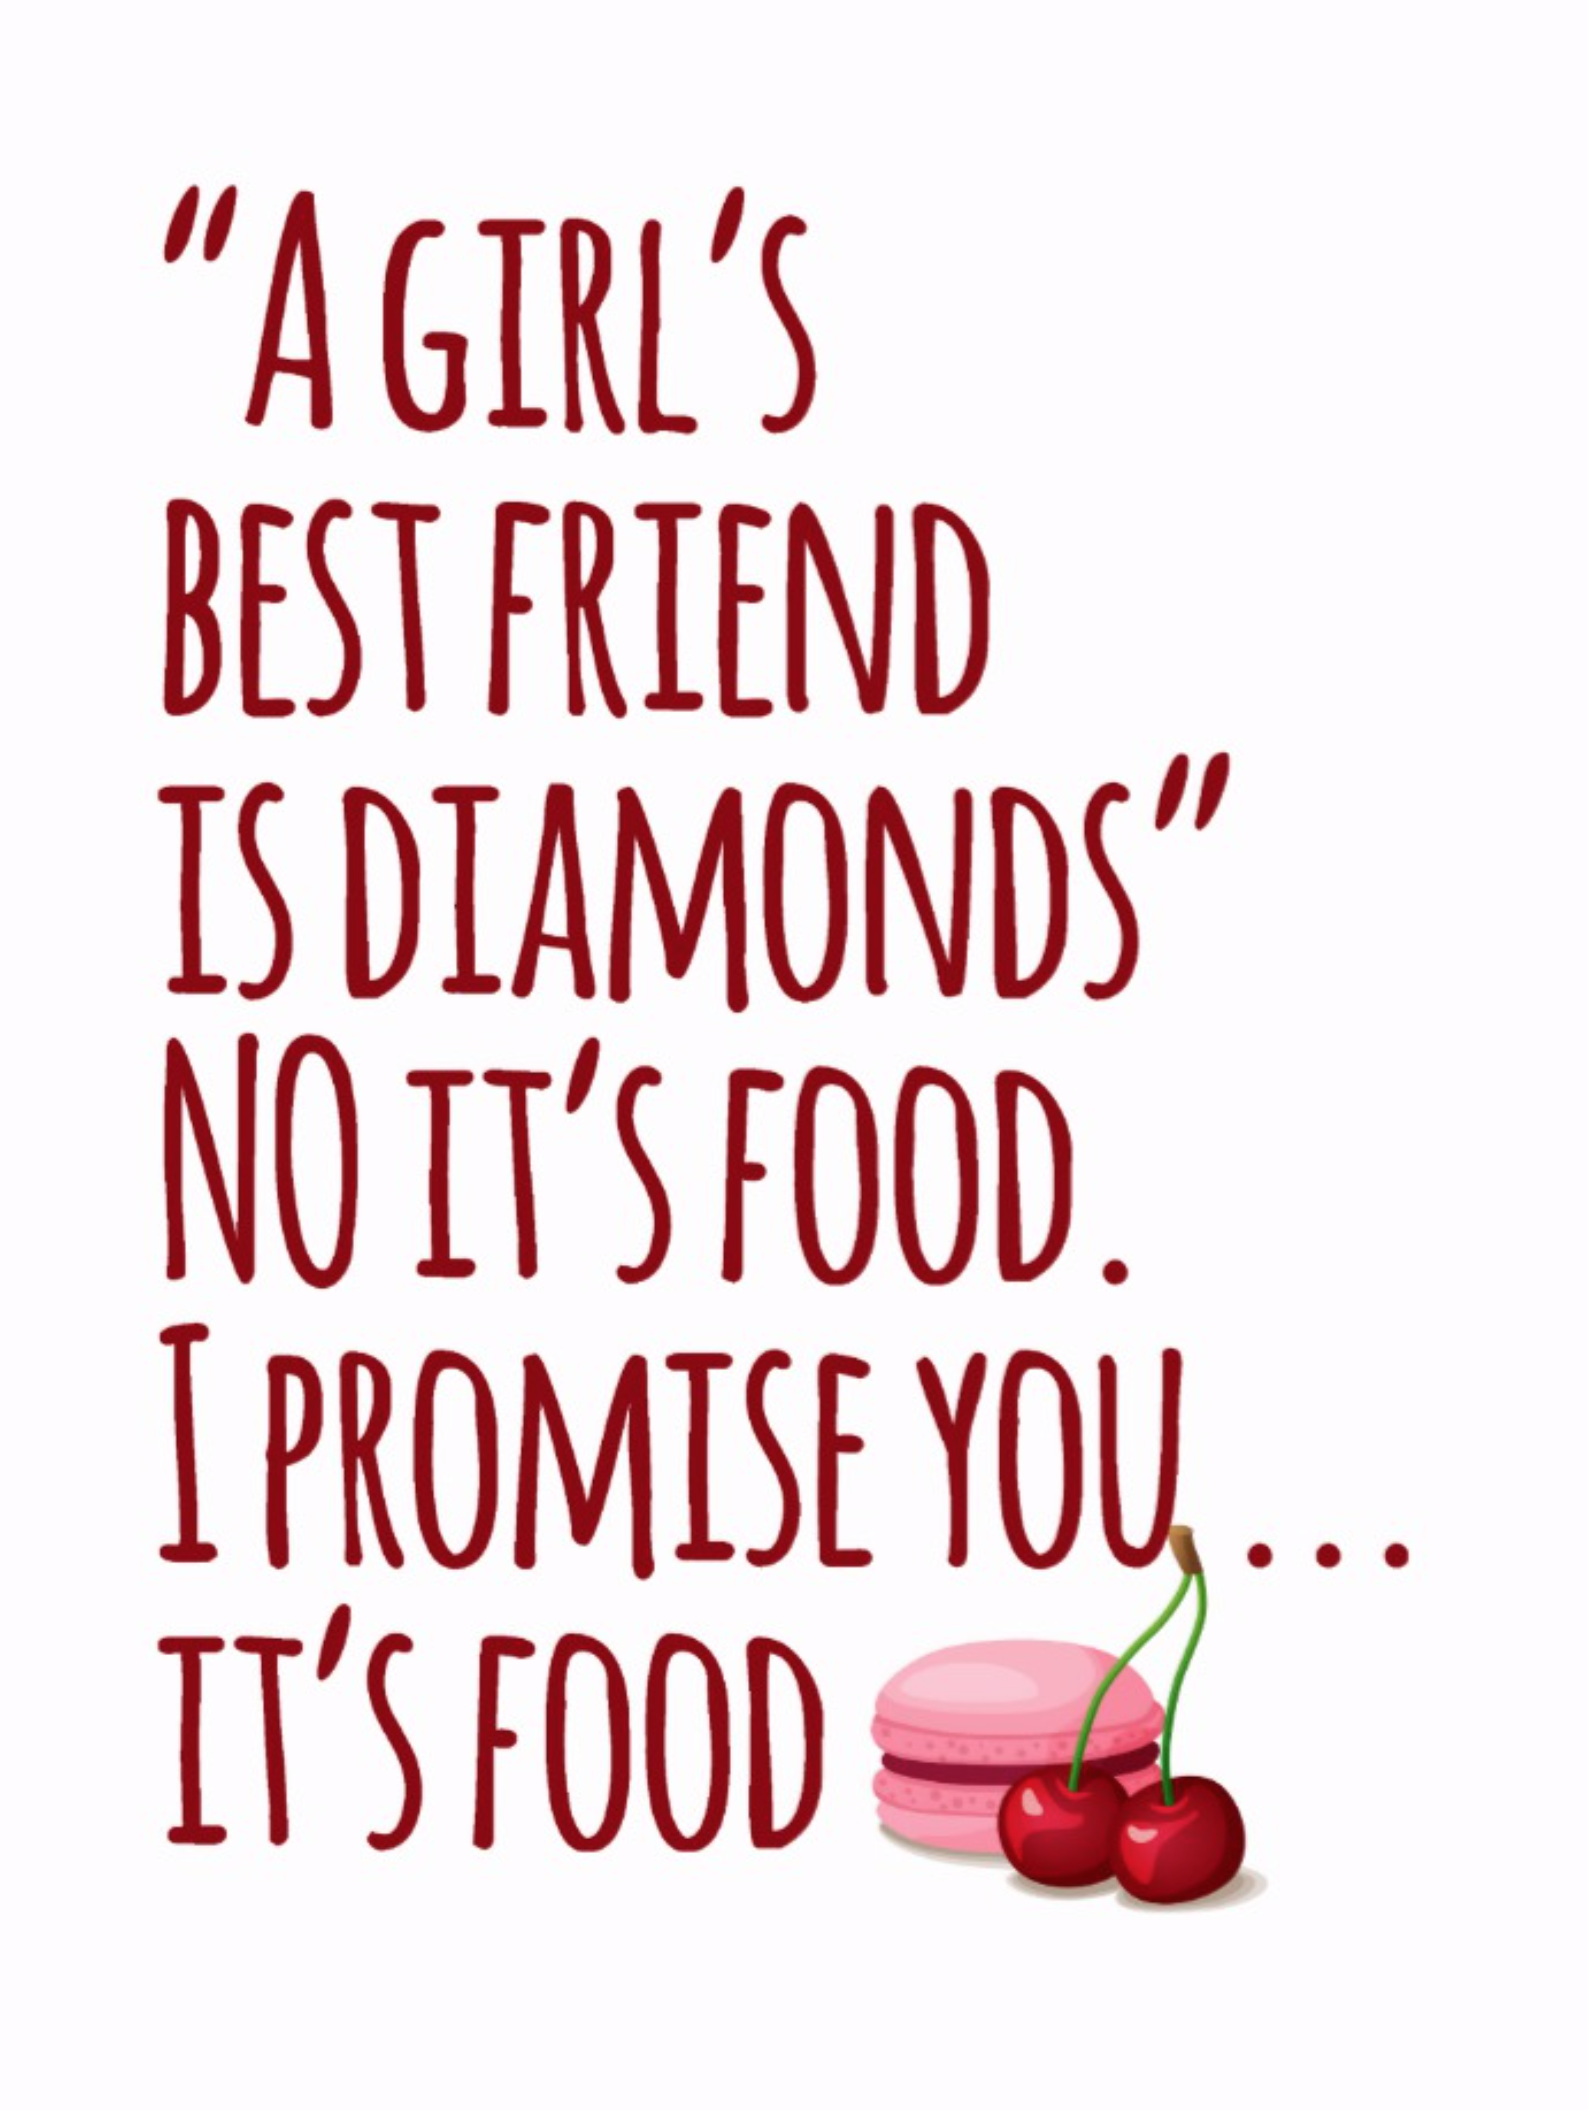 A Girls Best Friends Is Food Funny Quote Postcard A Girl S Best Friend Is Diamonds No It S Food I Funny Girly Quote Food Quotes Funny Funny Postcards